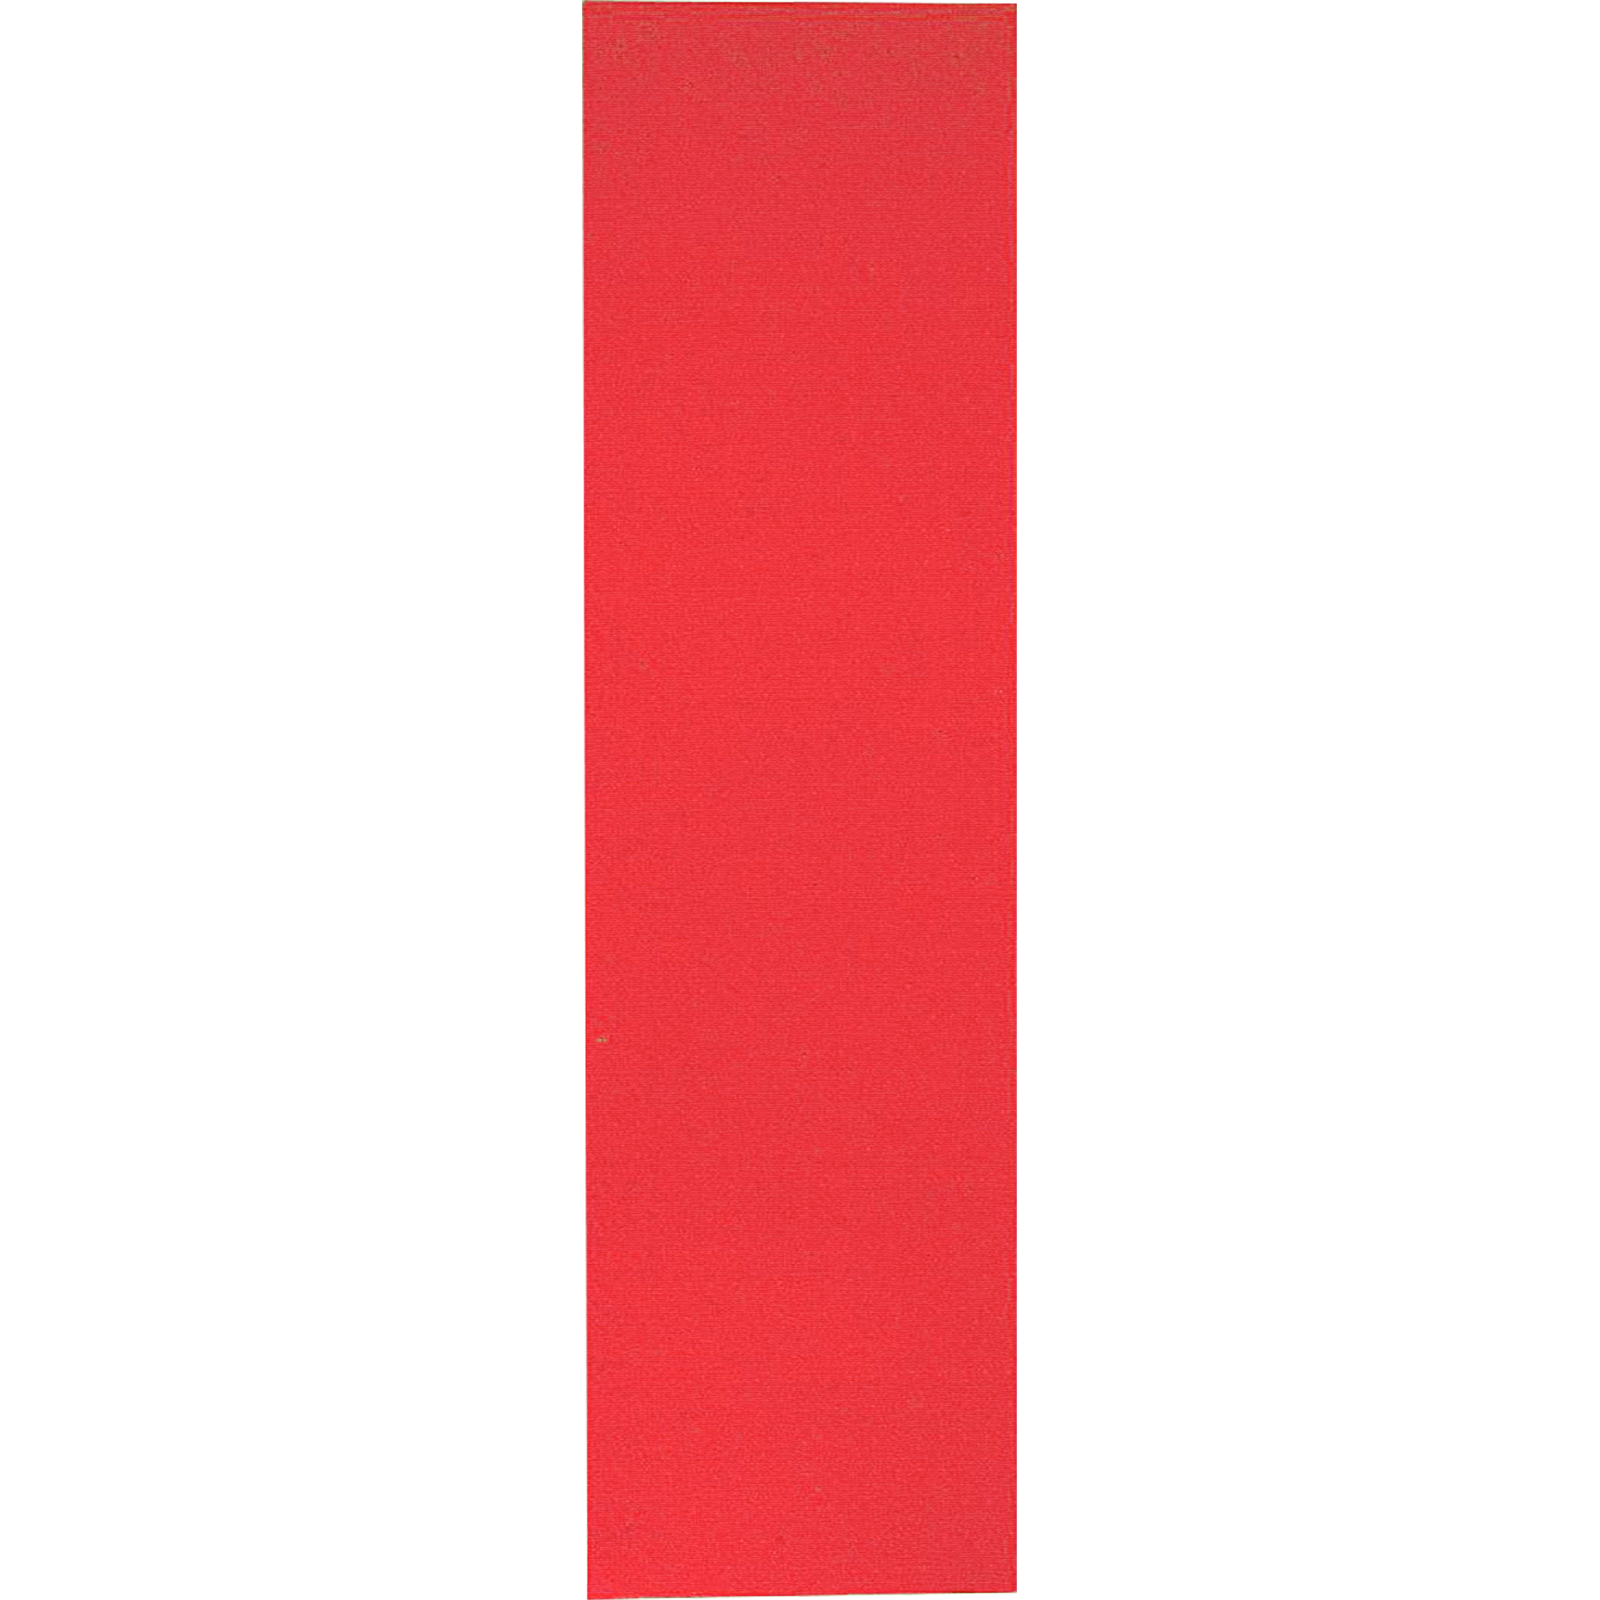 PIMP GRIP SINGLE SHEET-PANIC RED